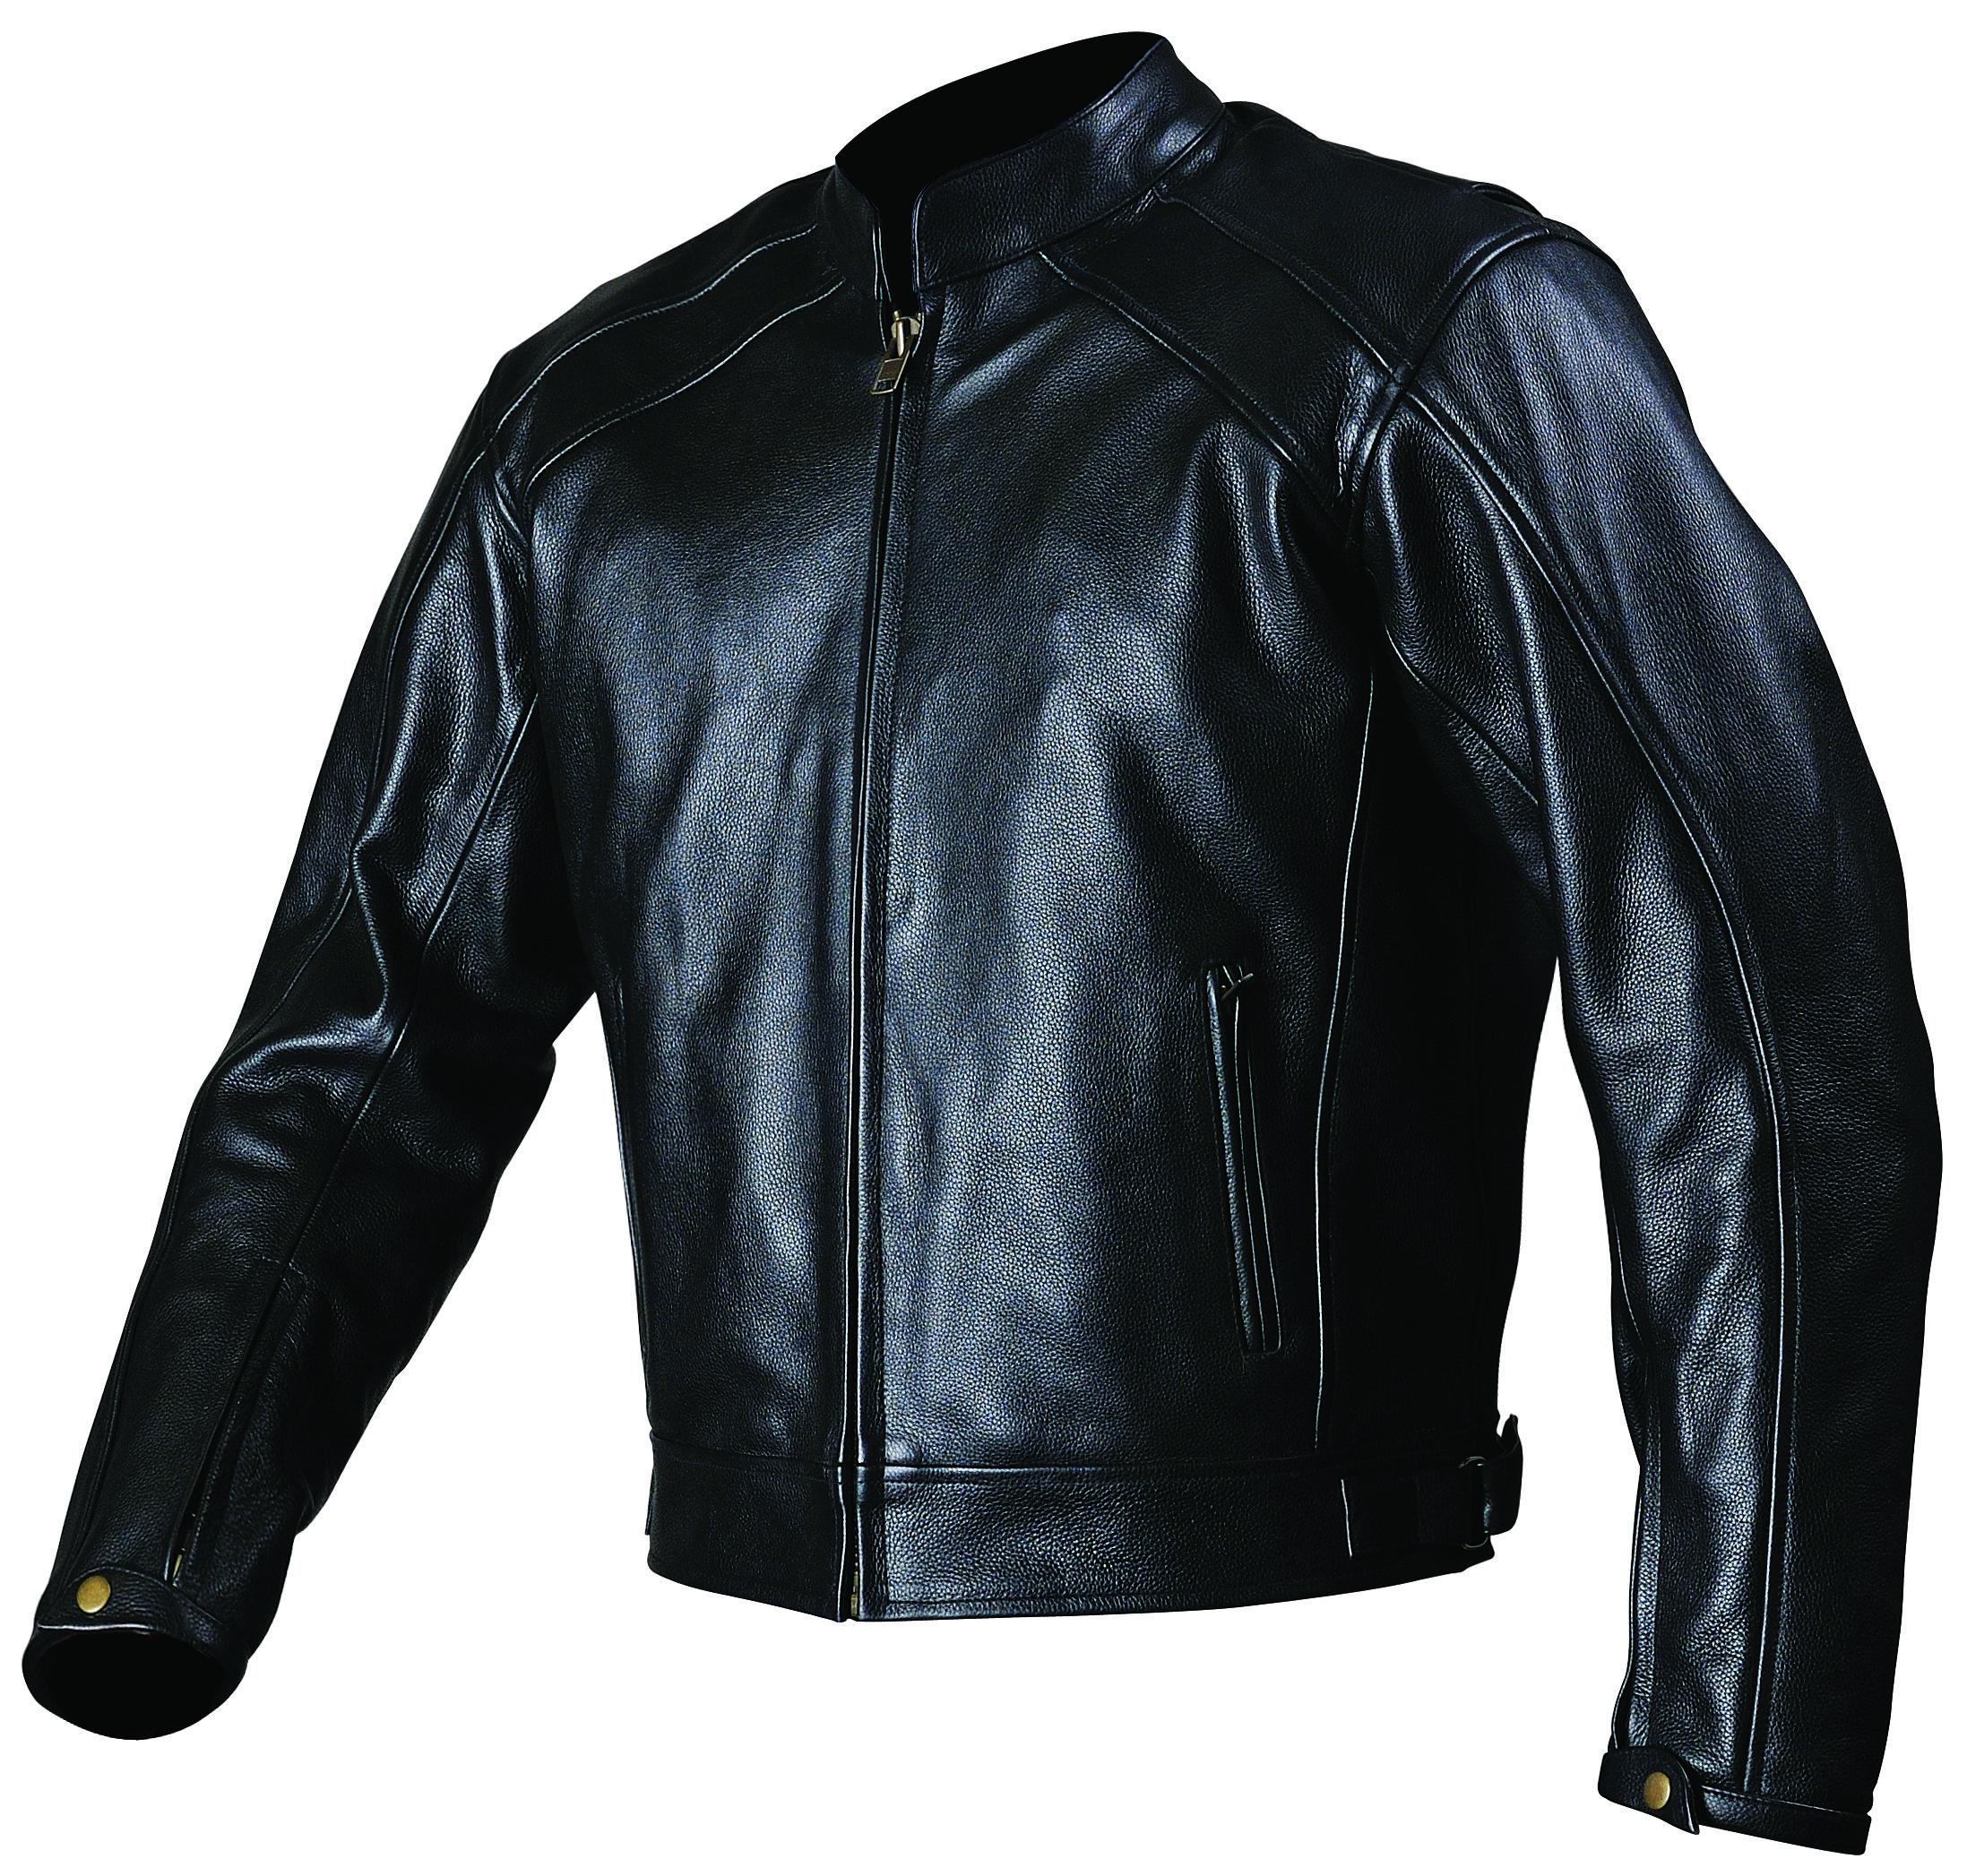 Classic Leather Jacket Classic Leather Jacket Leather Jacket Black